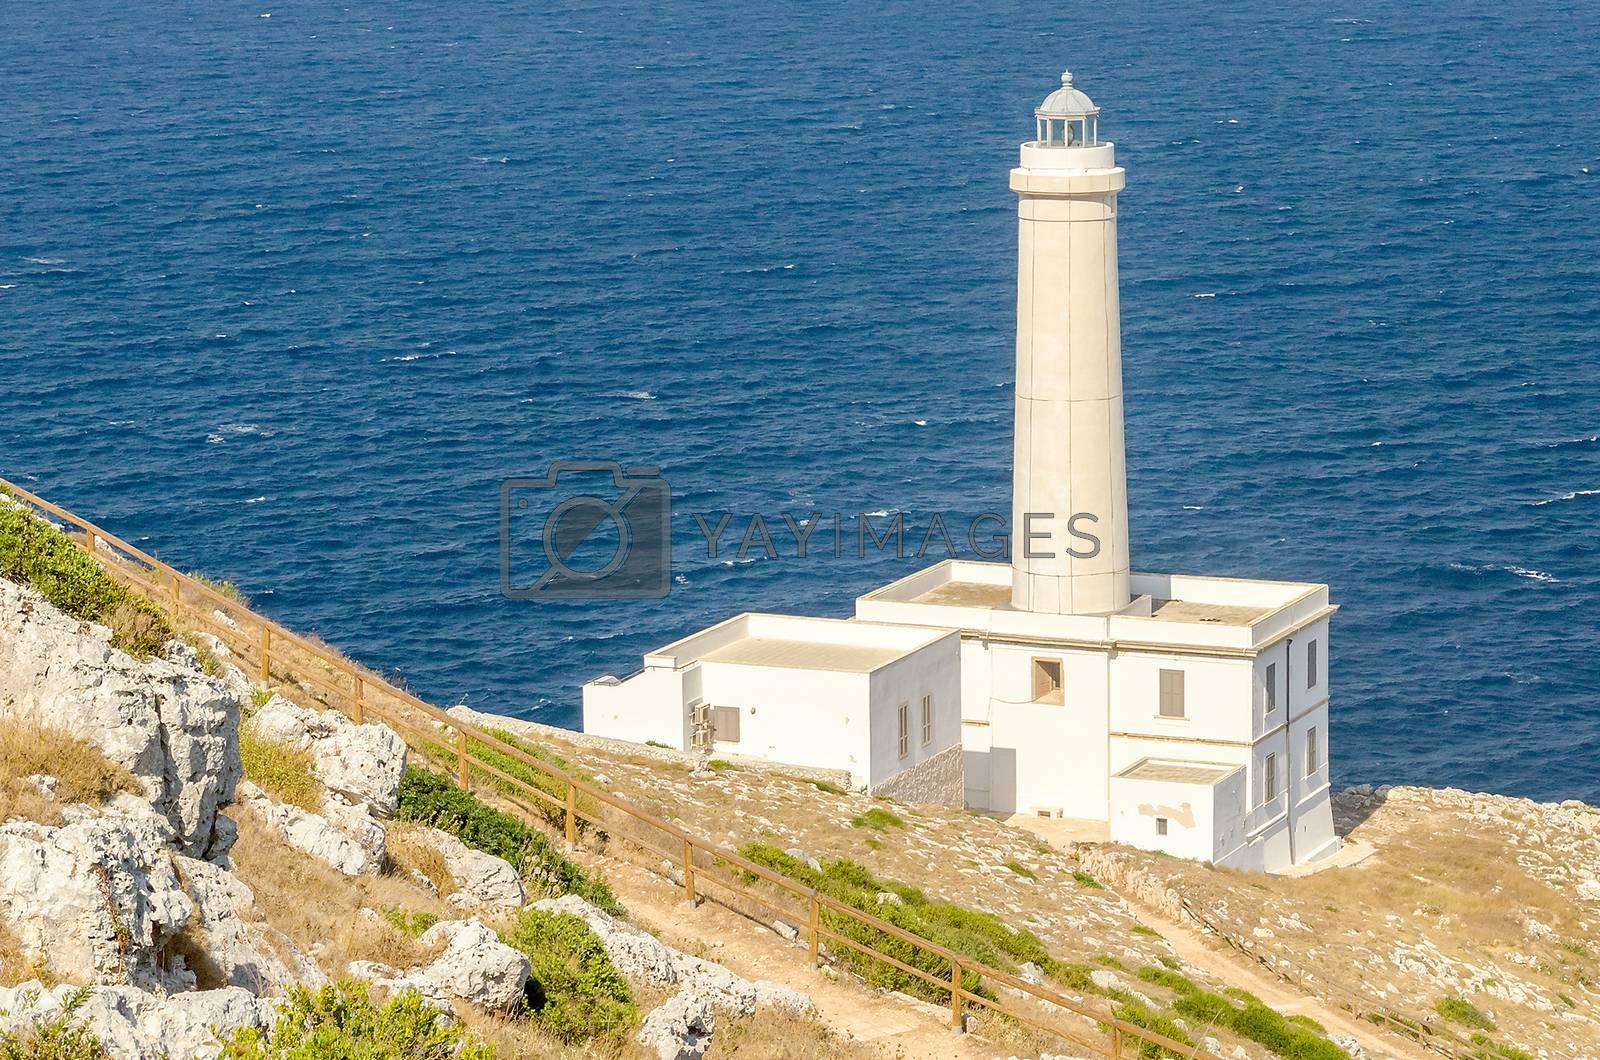 The iconic lighthouse of Capo d'Otranto, Salento, Apulia, Italy by Marco Rubino